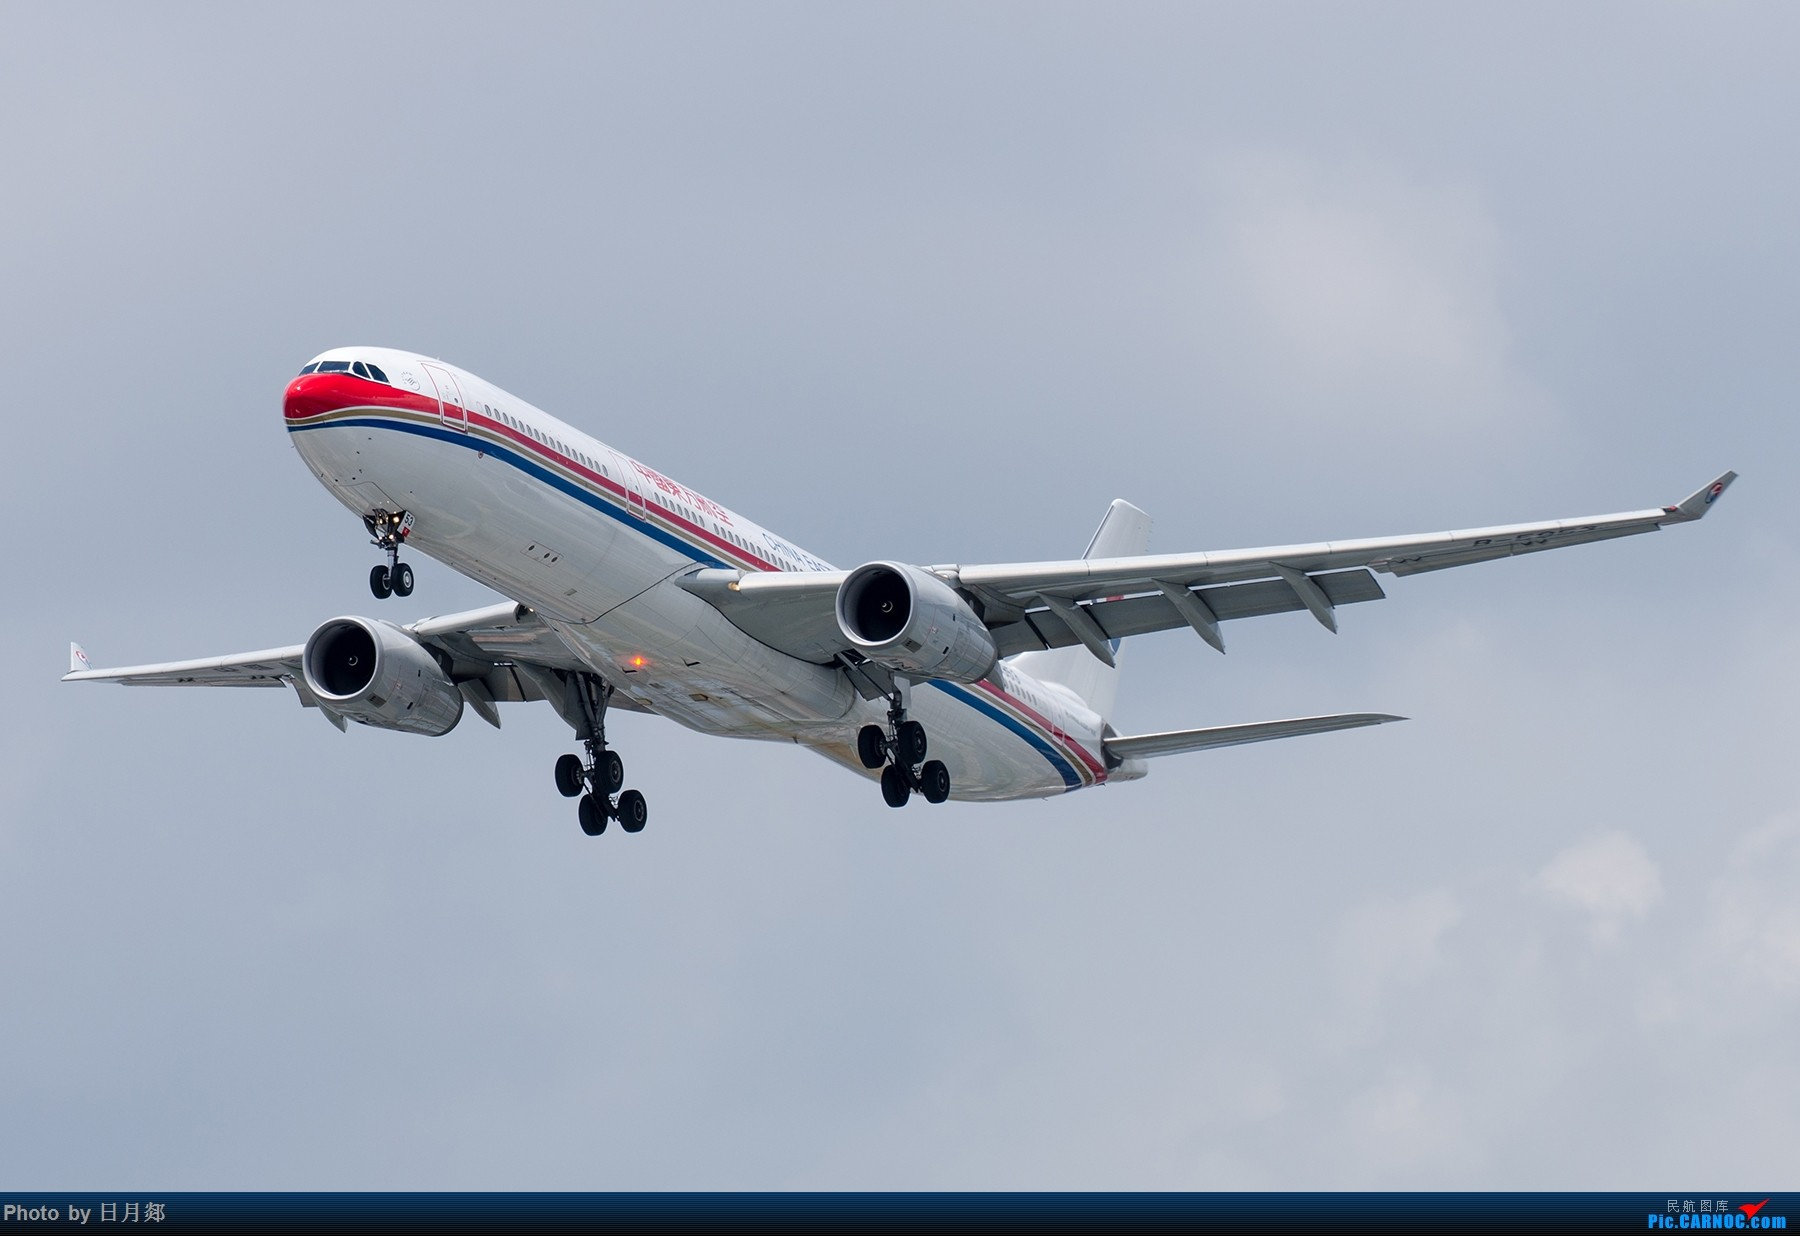 Re:[原创]【SHA拍机*1800大图】图要抓紧发,不然就要炒冷饭,大头镇贴 AIRBUS A330-300 B-5953 中国上海虹桥国际机场